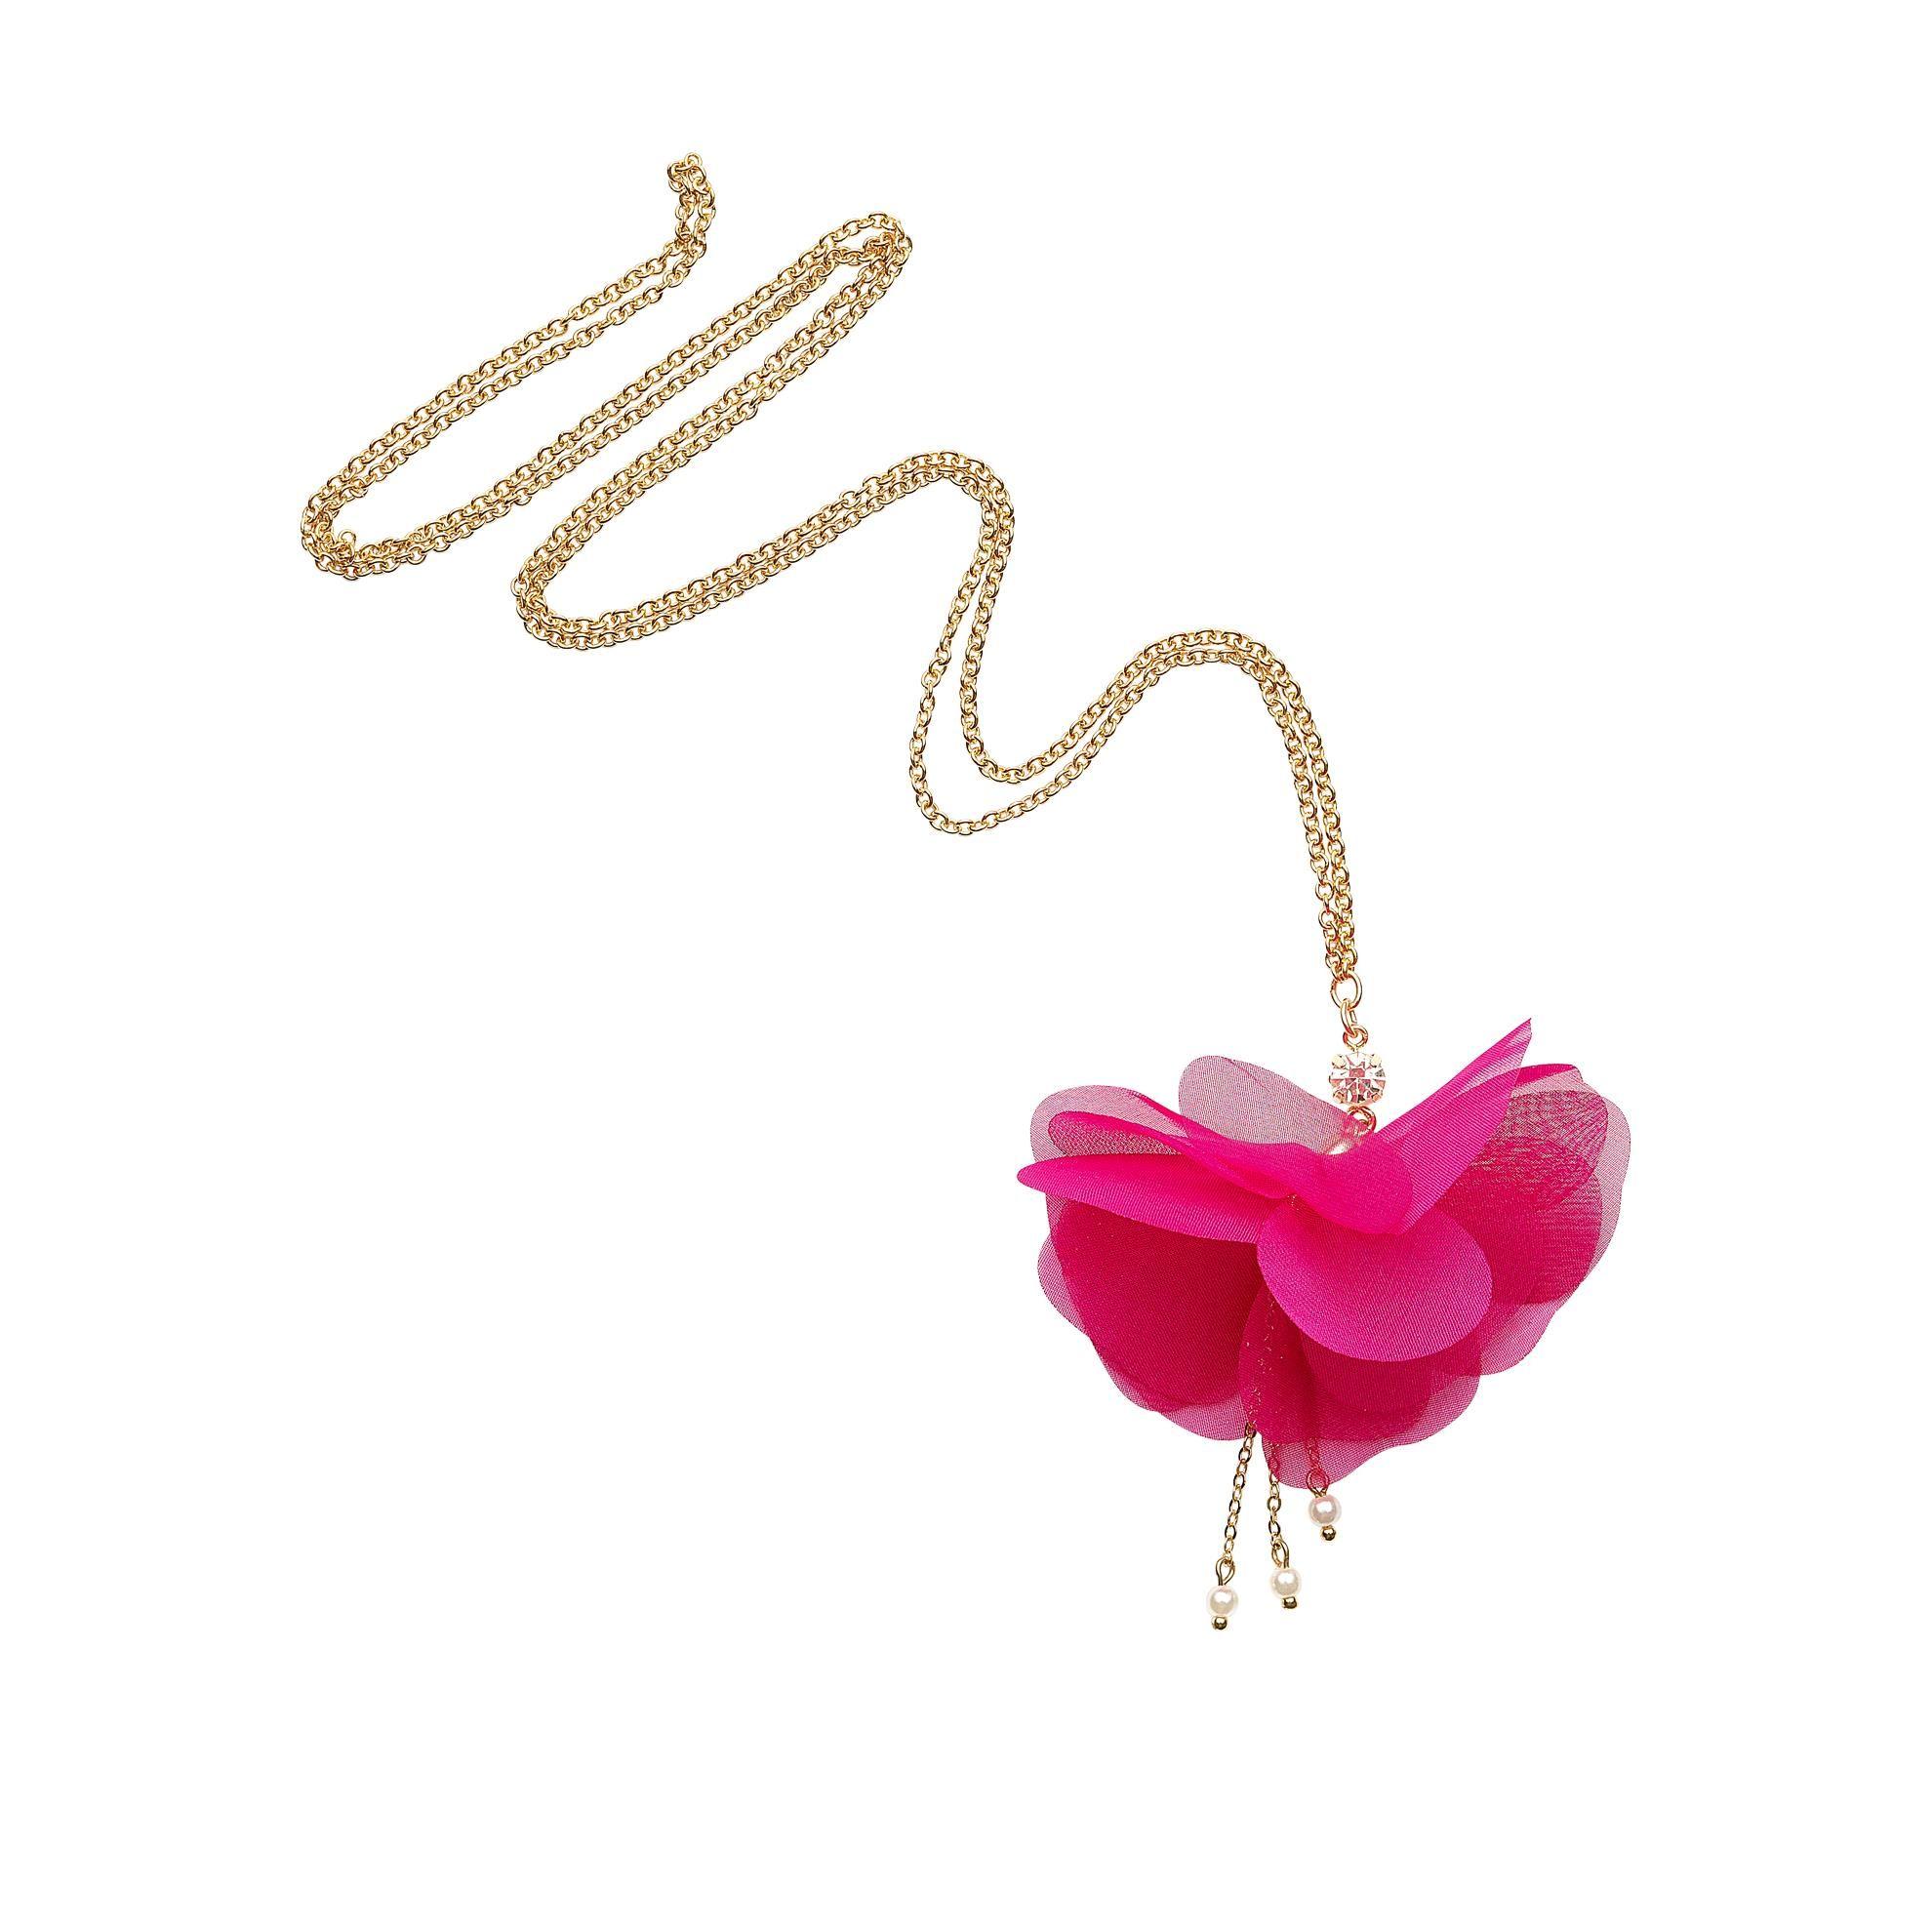 b14dc915b Peachica Flower Necklace (31239) Necklaces – Accessories | Oriflame  Cosmetics